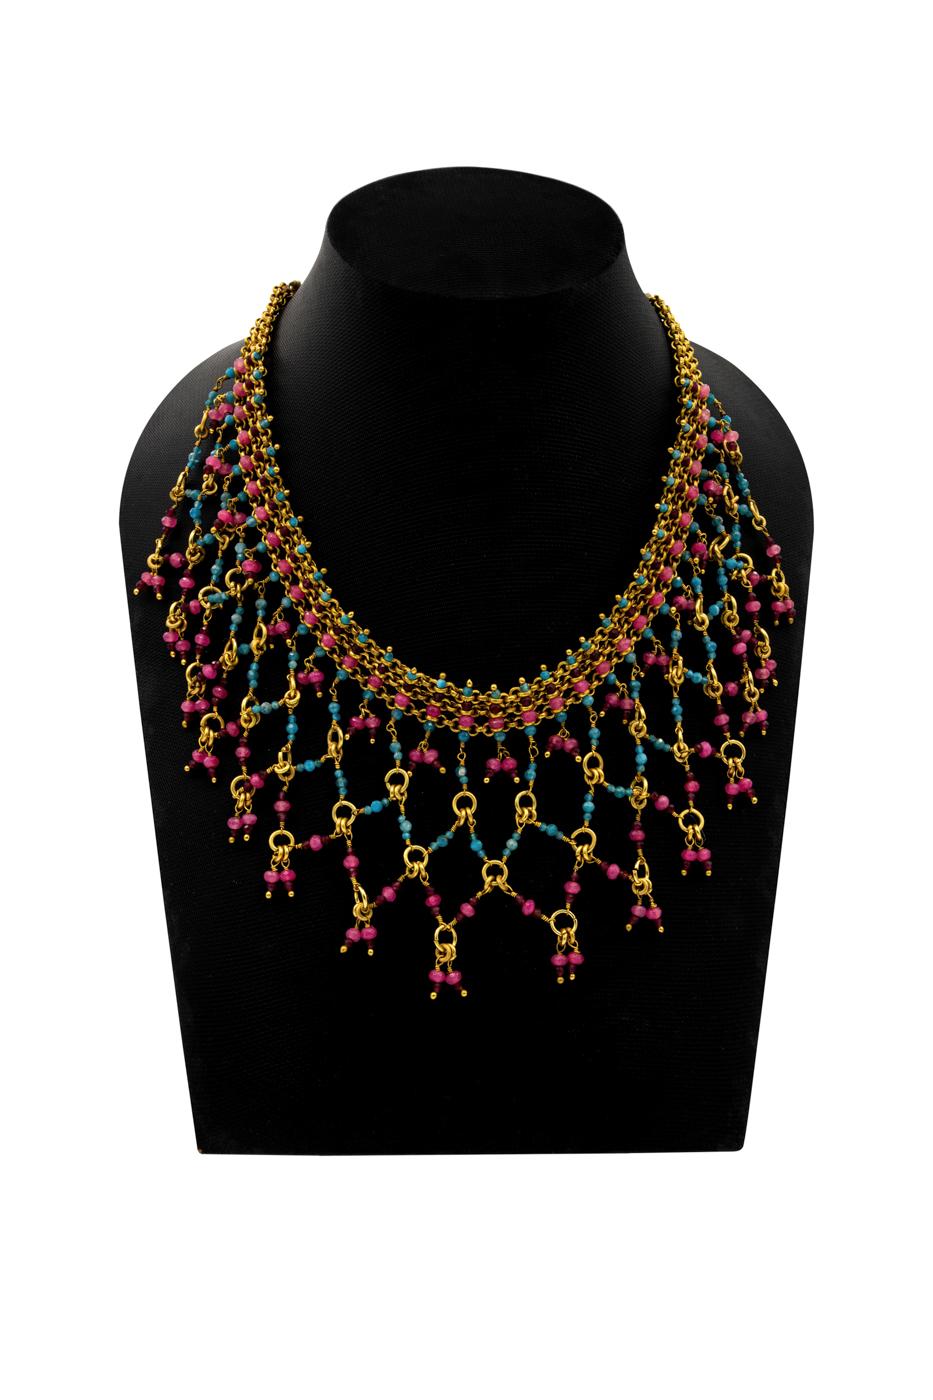 Collar India, Con piedras de apatita, granate, ágata rosada